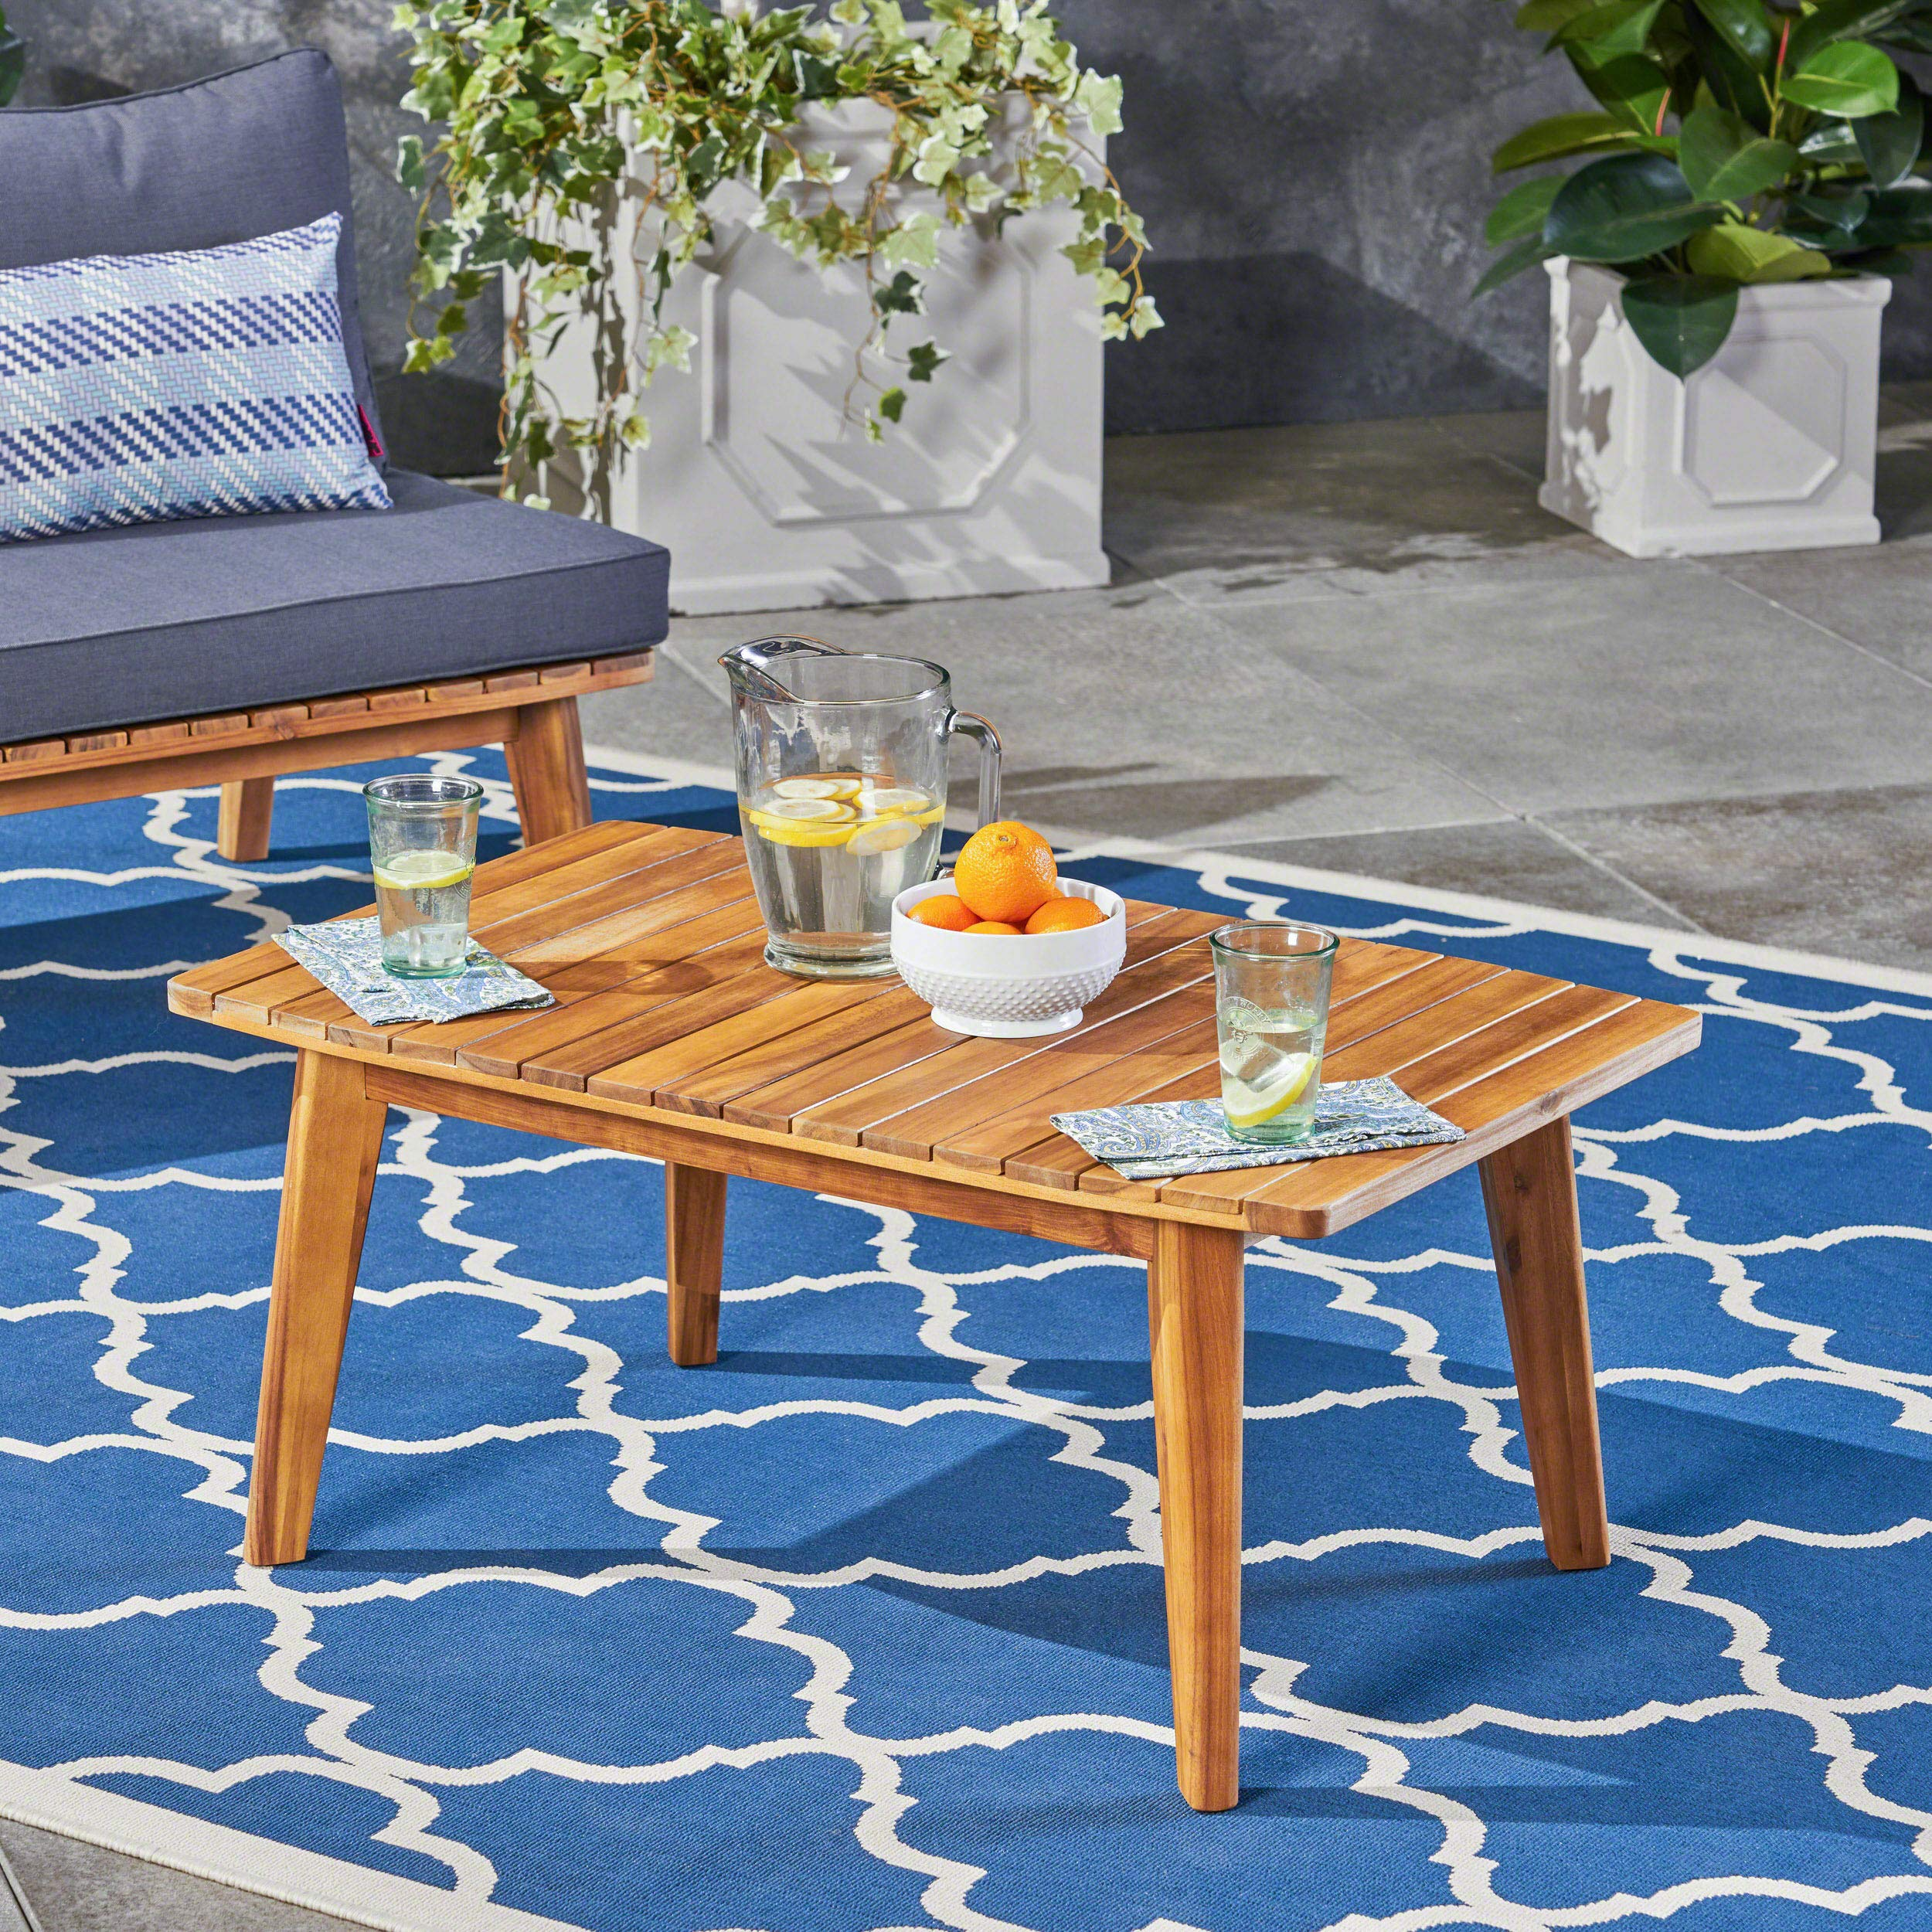 Great Deal Furniture Boyle Outdoor Acacia Wood Coffee Table, Teak Finish